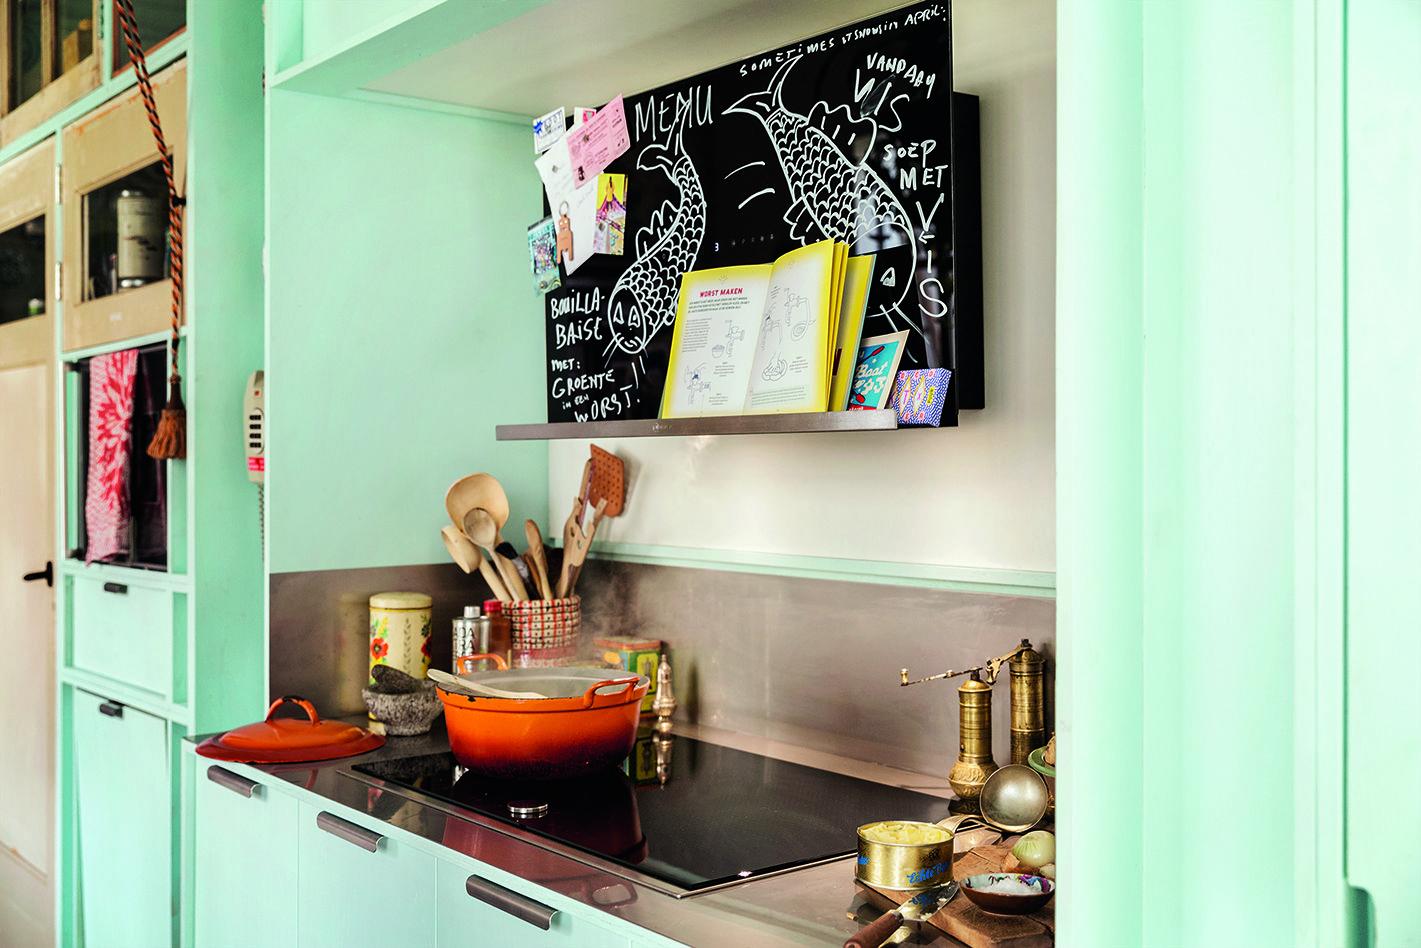 Groß Küche Wandeckschrank Uk Bilder - Küche Set Ideen ...